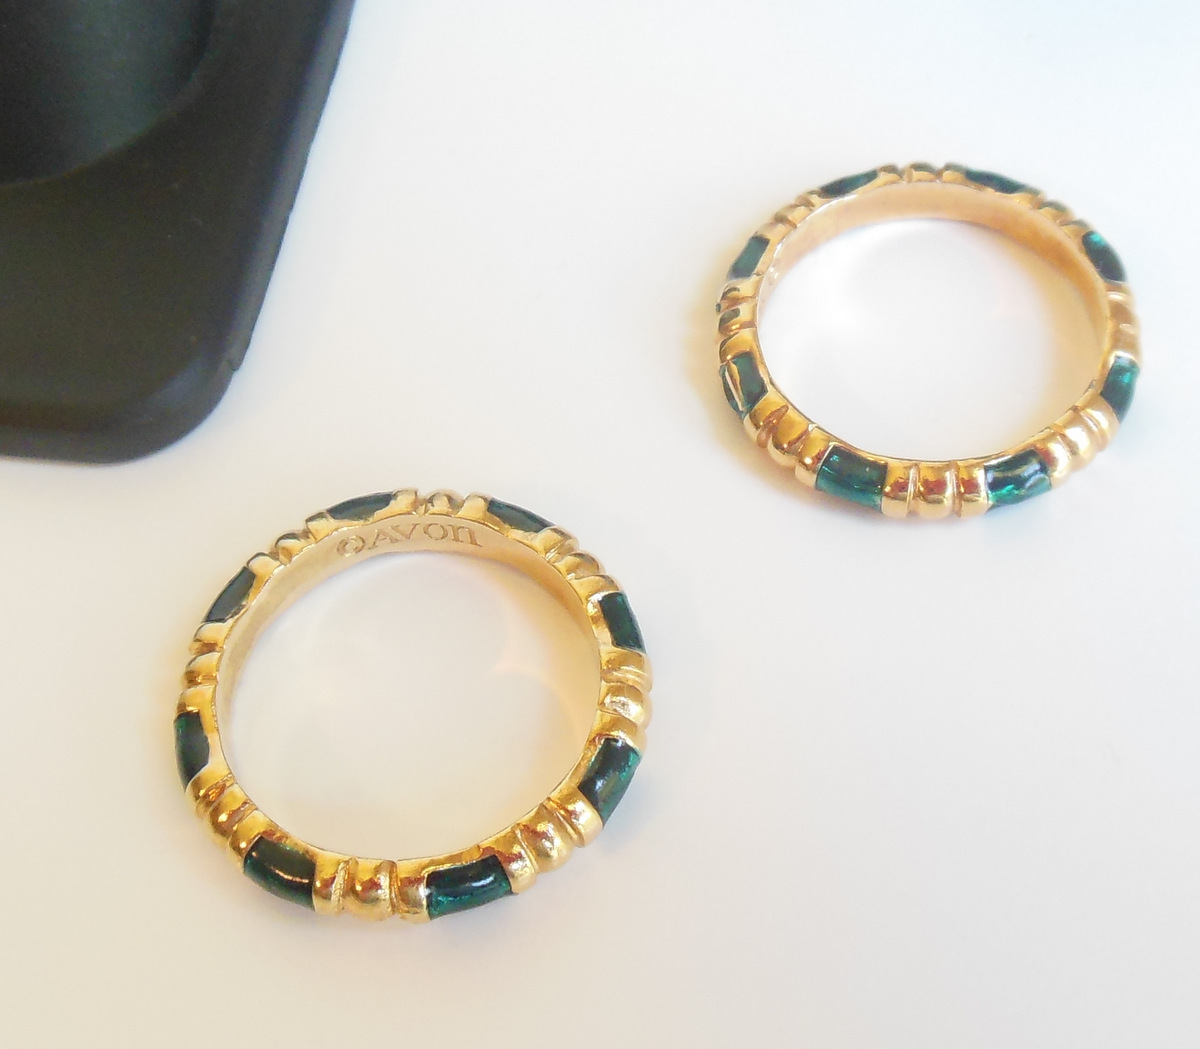 Vintage 70s Avon ring Gold green teal enamel band Royal Circle 1979 minimalist dainty size 6